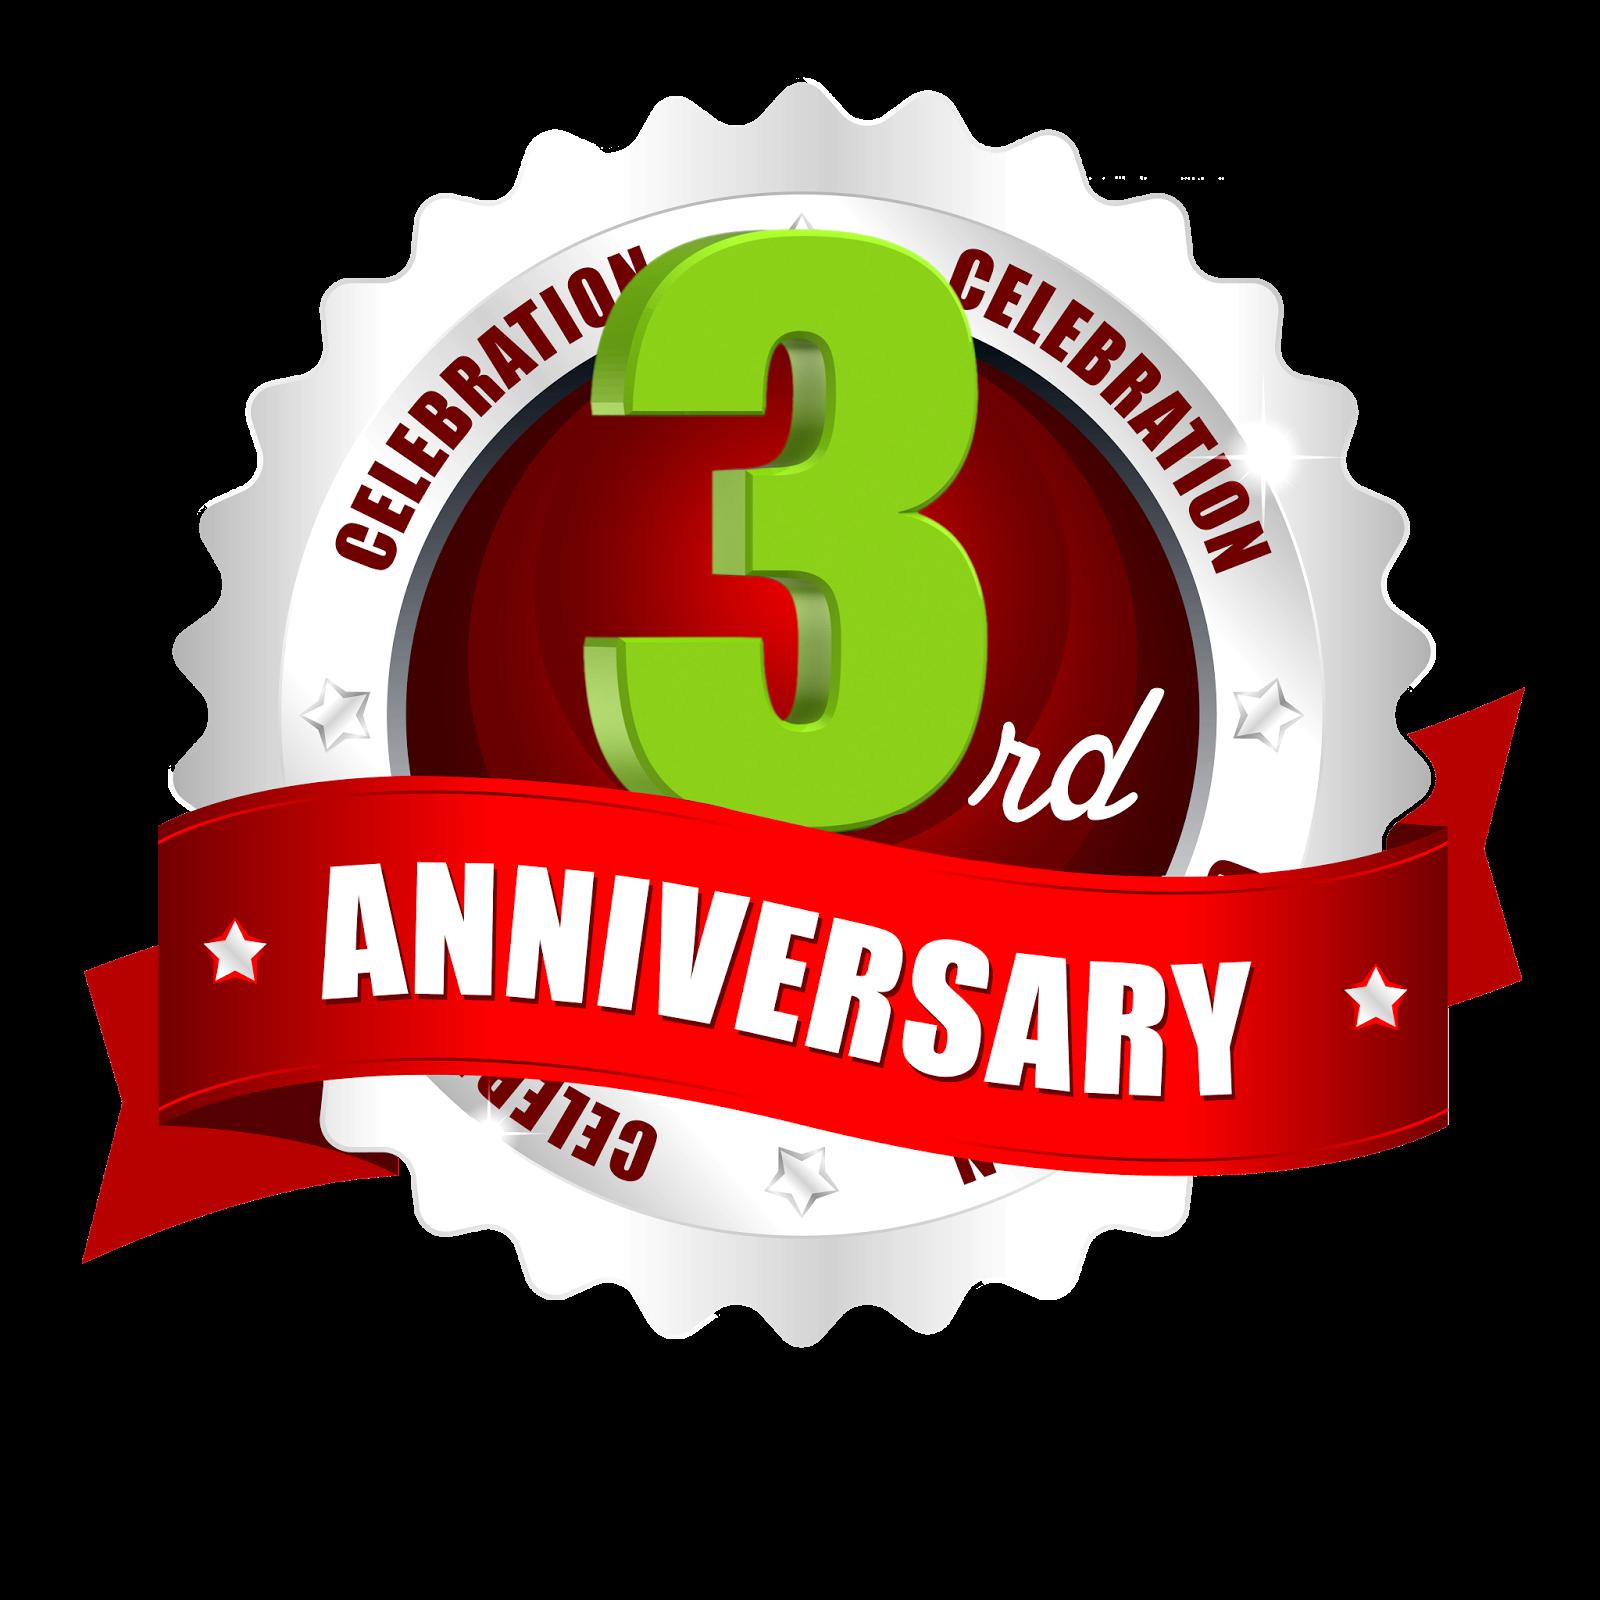 anniversary logo vector - photo #1